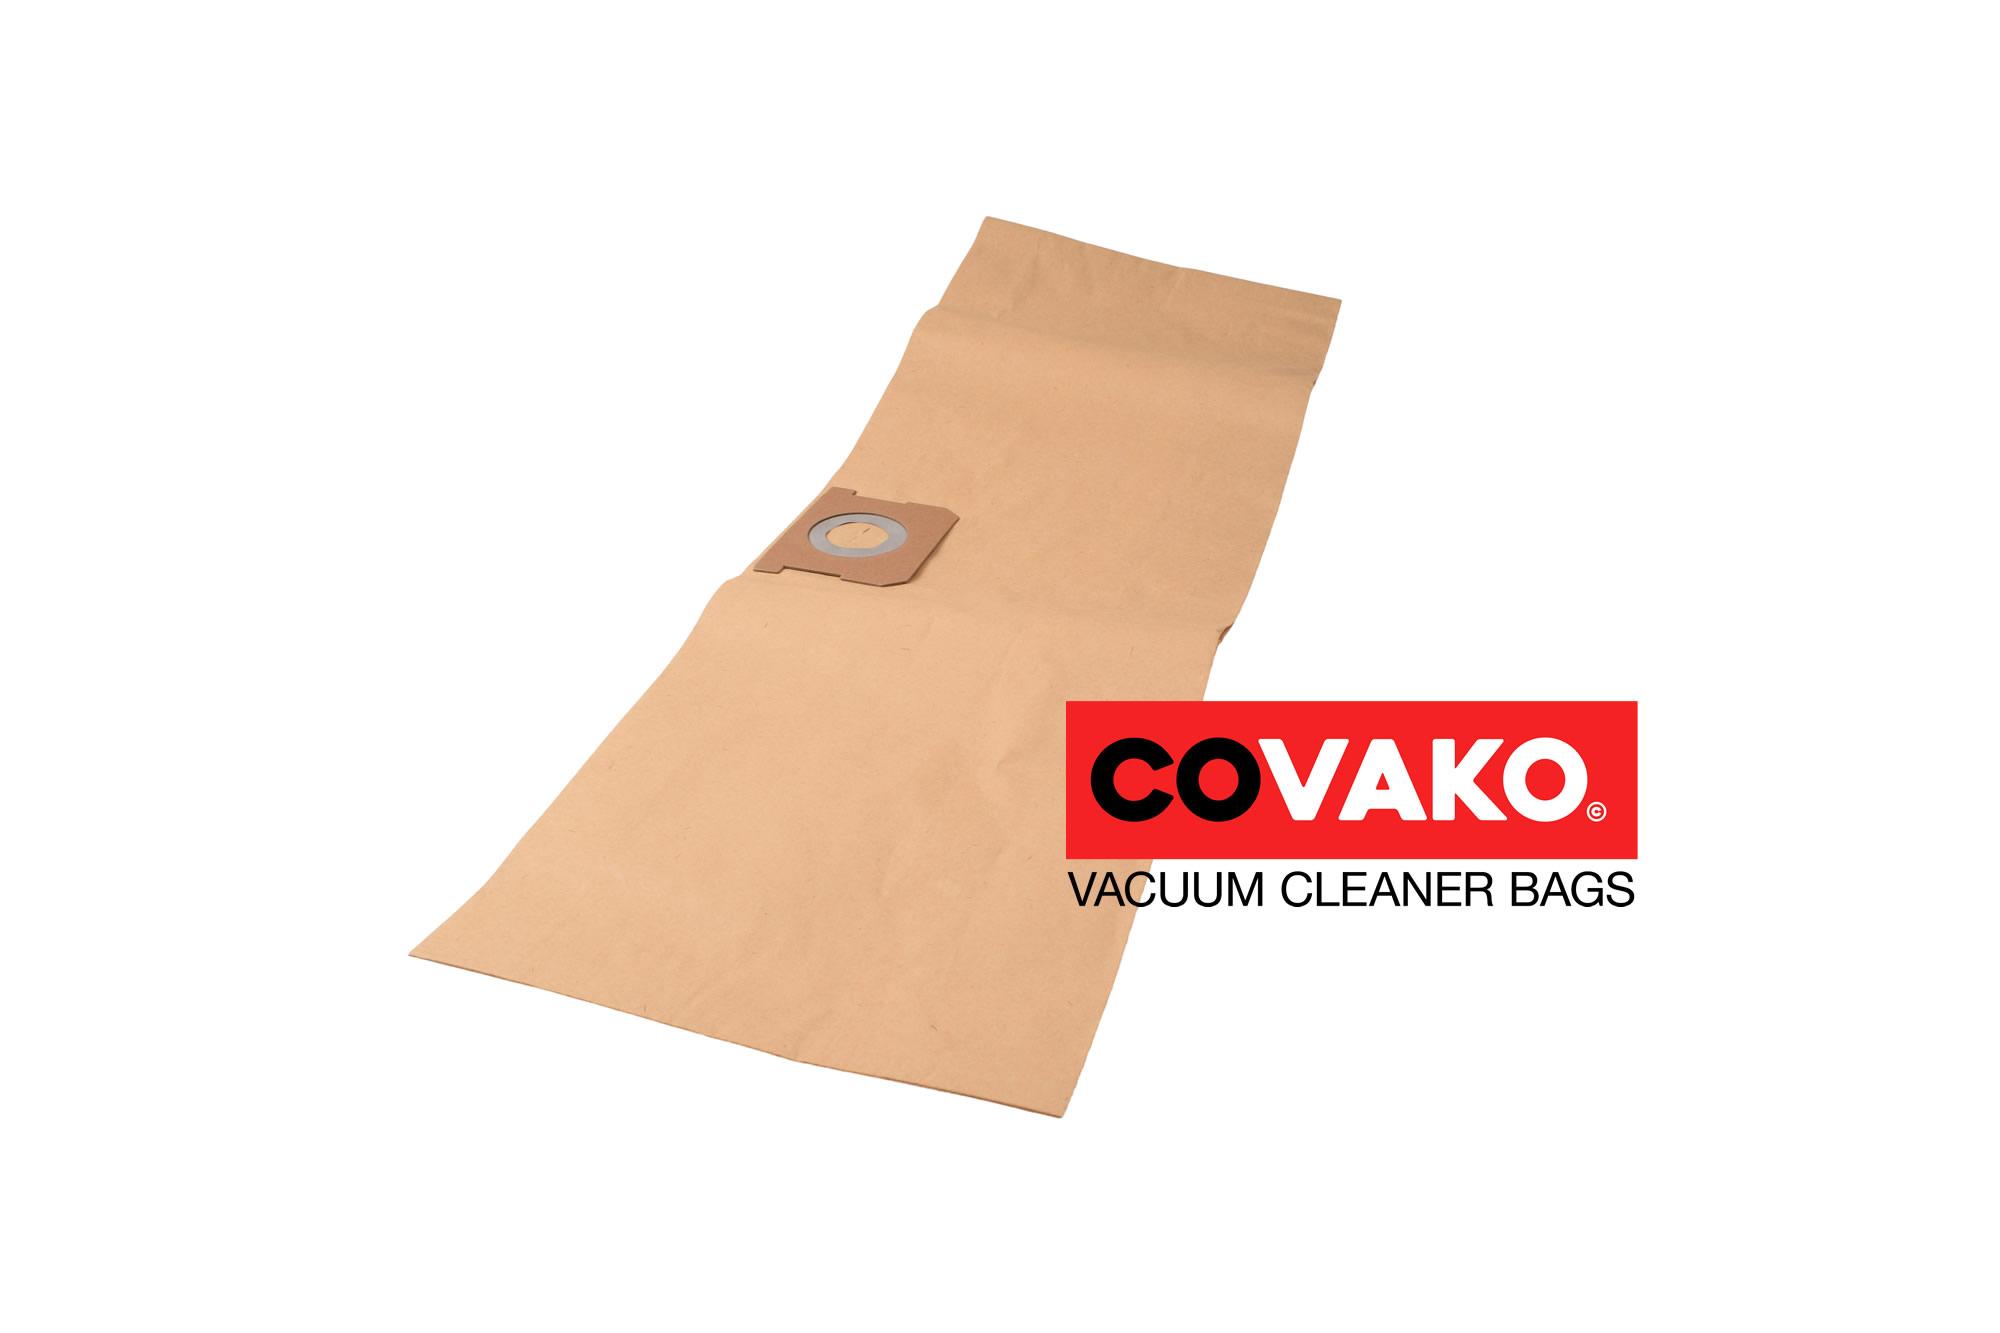 Bauhaus Shop Vac Pro 25 / Paper - Bauhaus vacuum cleaner bags